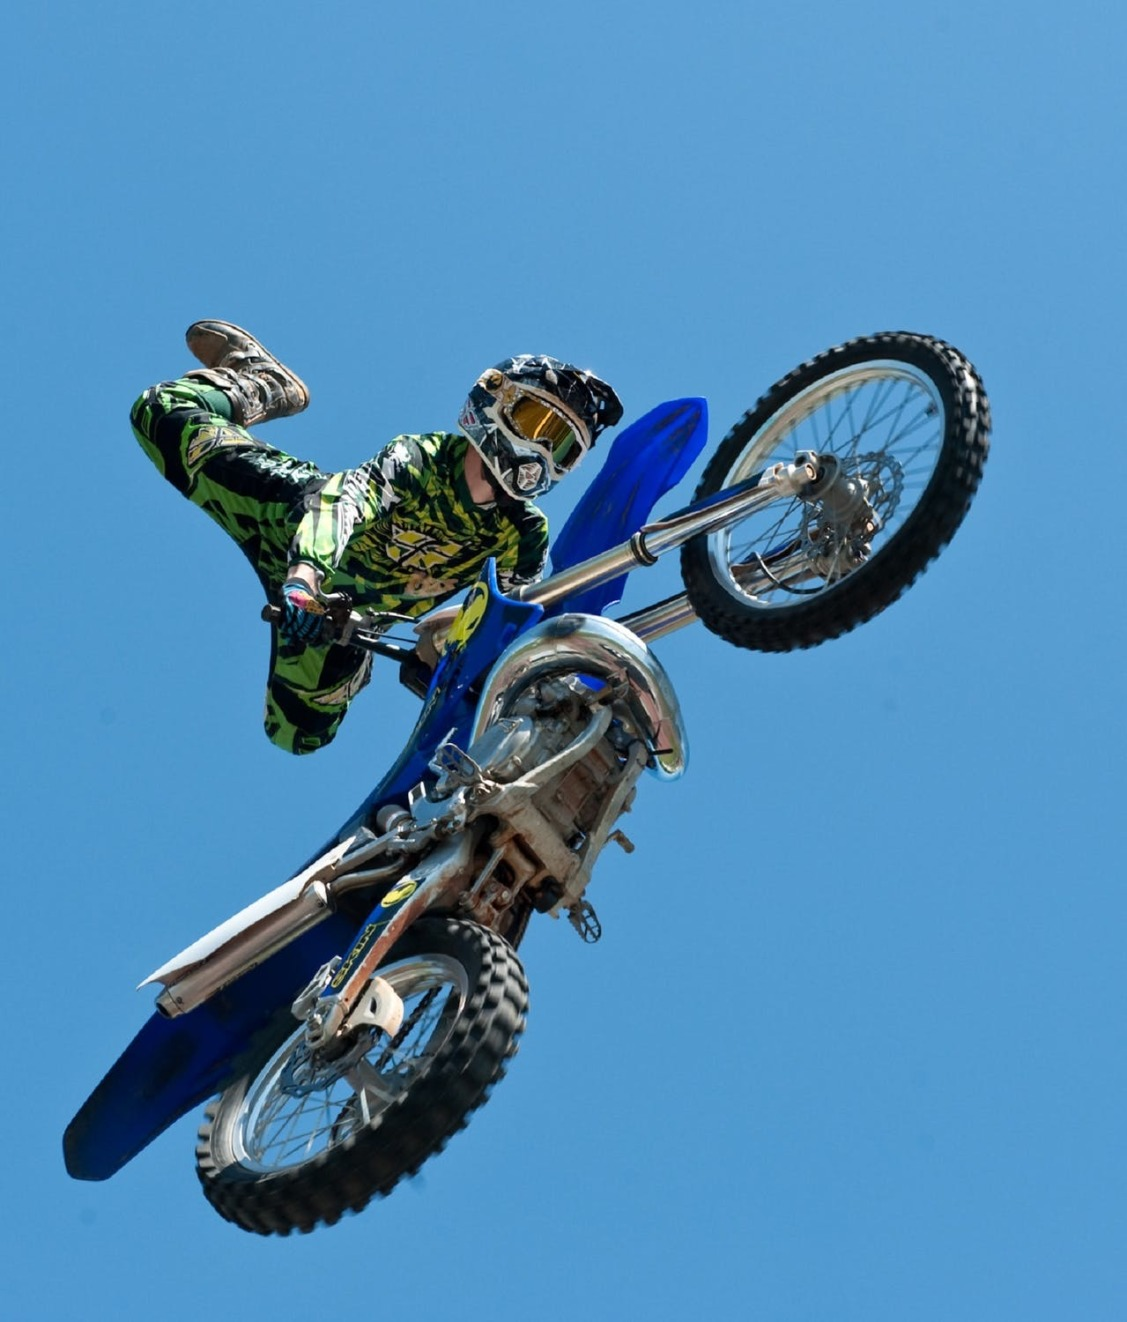 Motocross sport - Original image